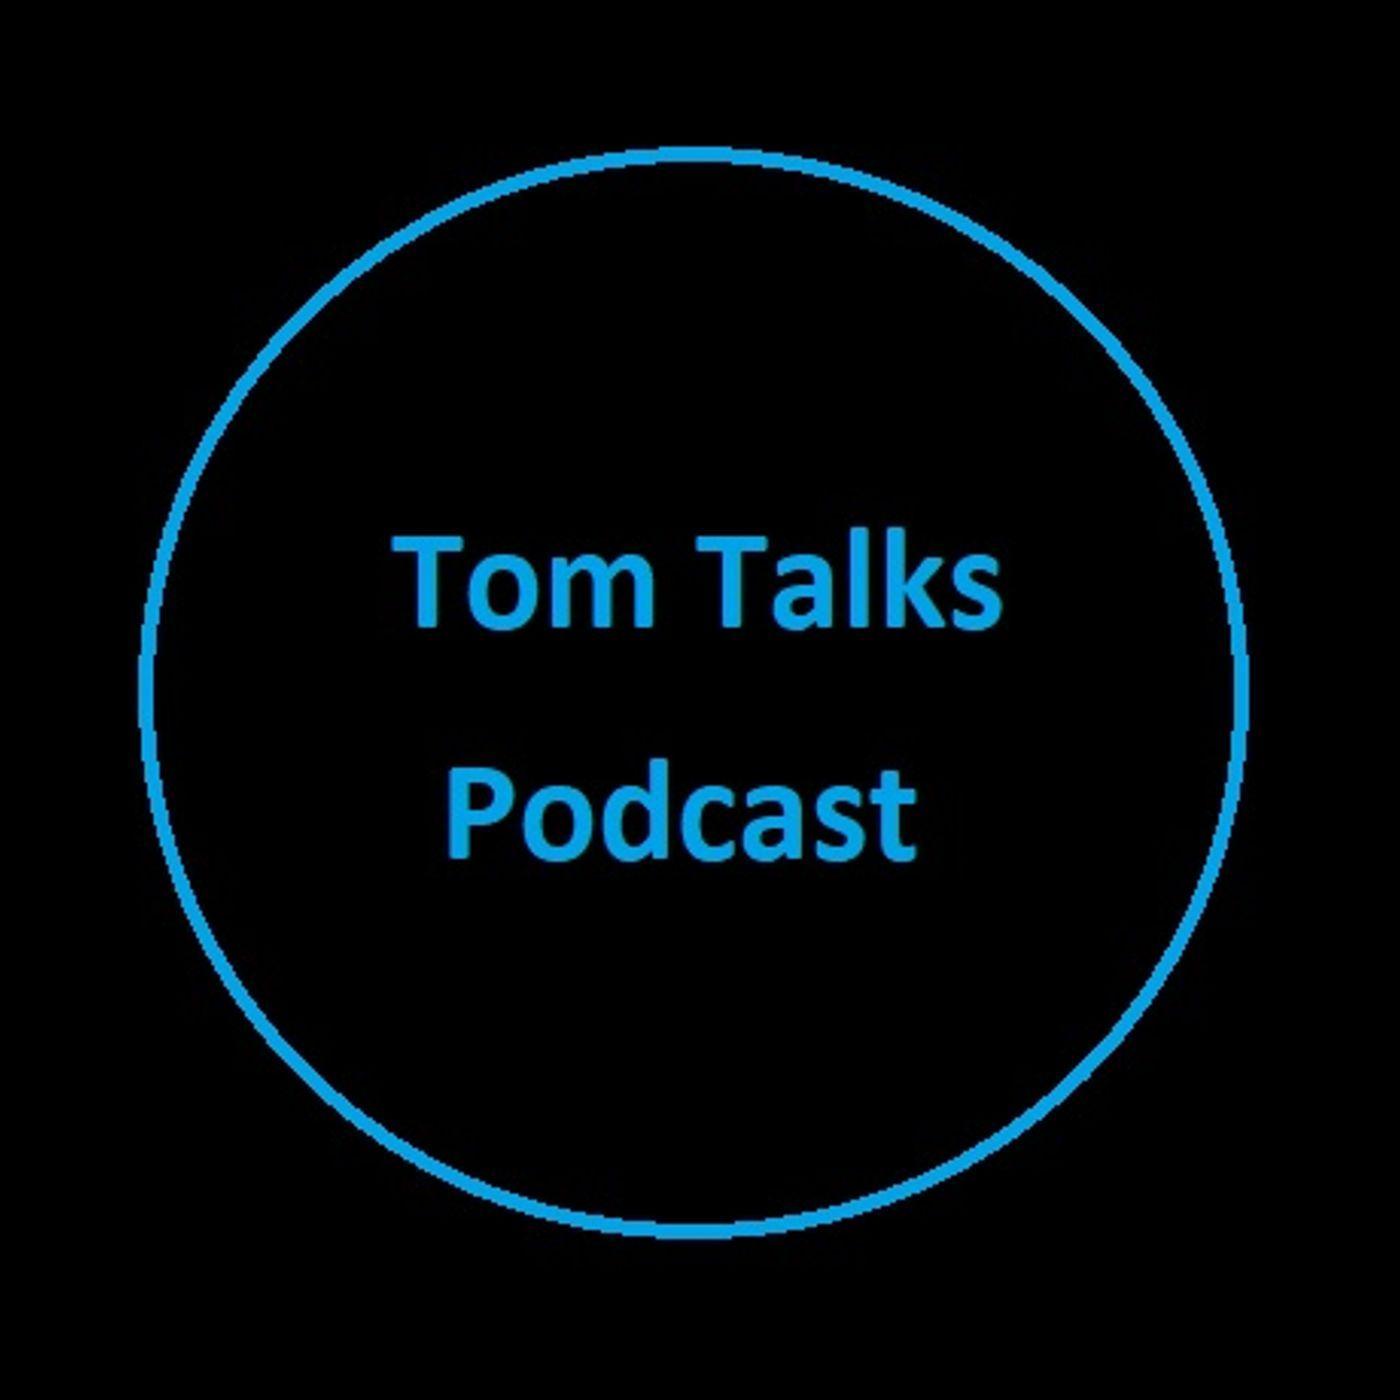 -Tom Talks Podcast #1-